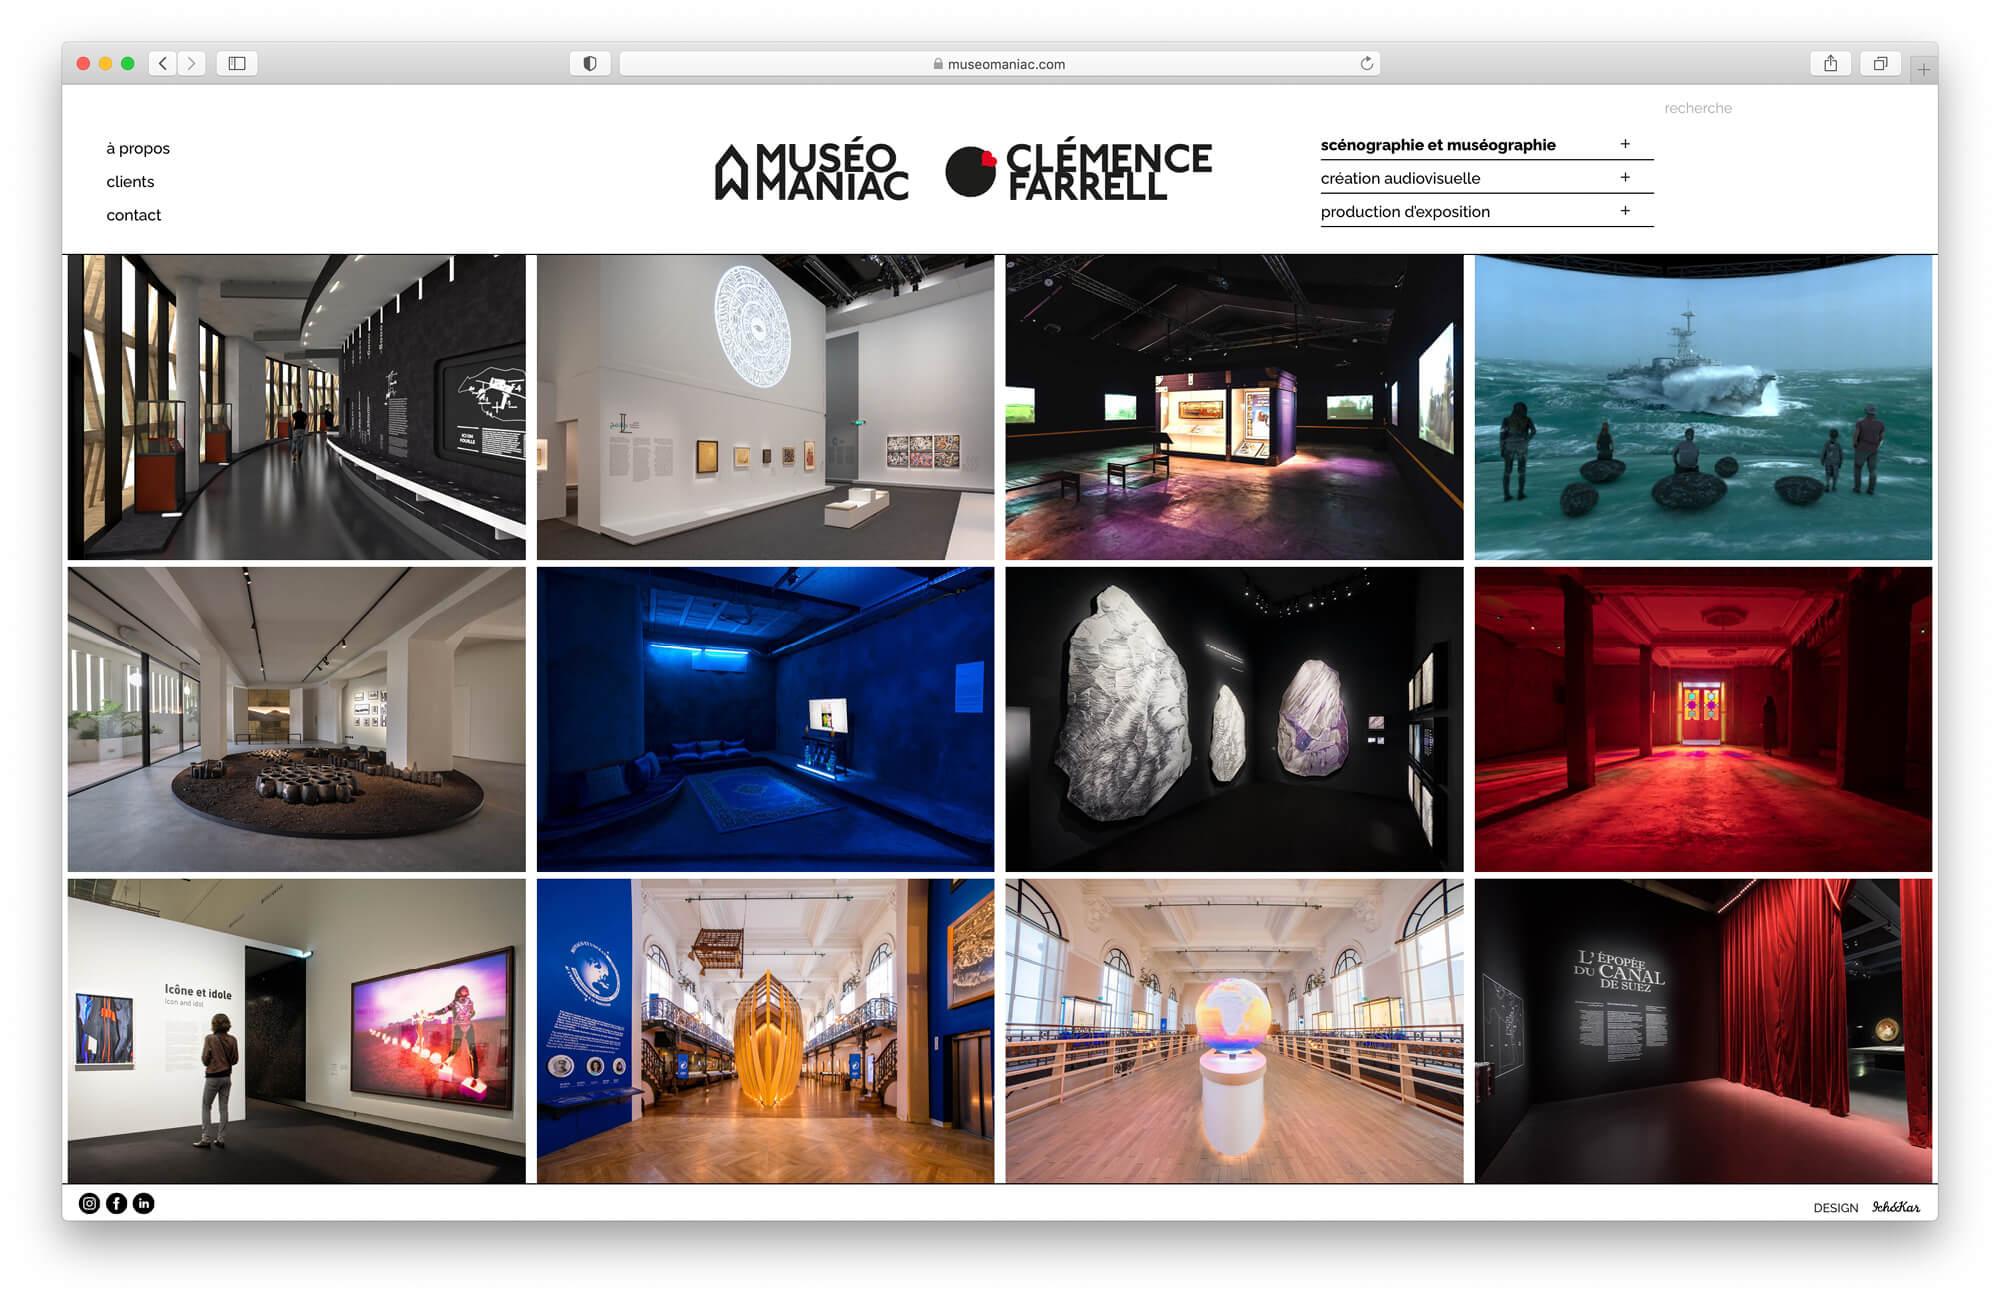 clemence-farrell-museomaniac-site-web-scenographie-ichetkar8